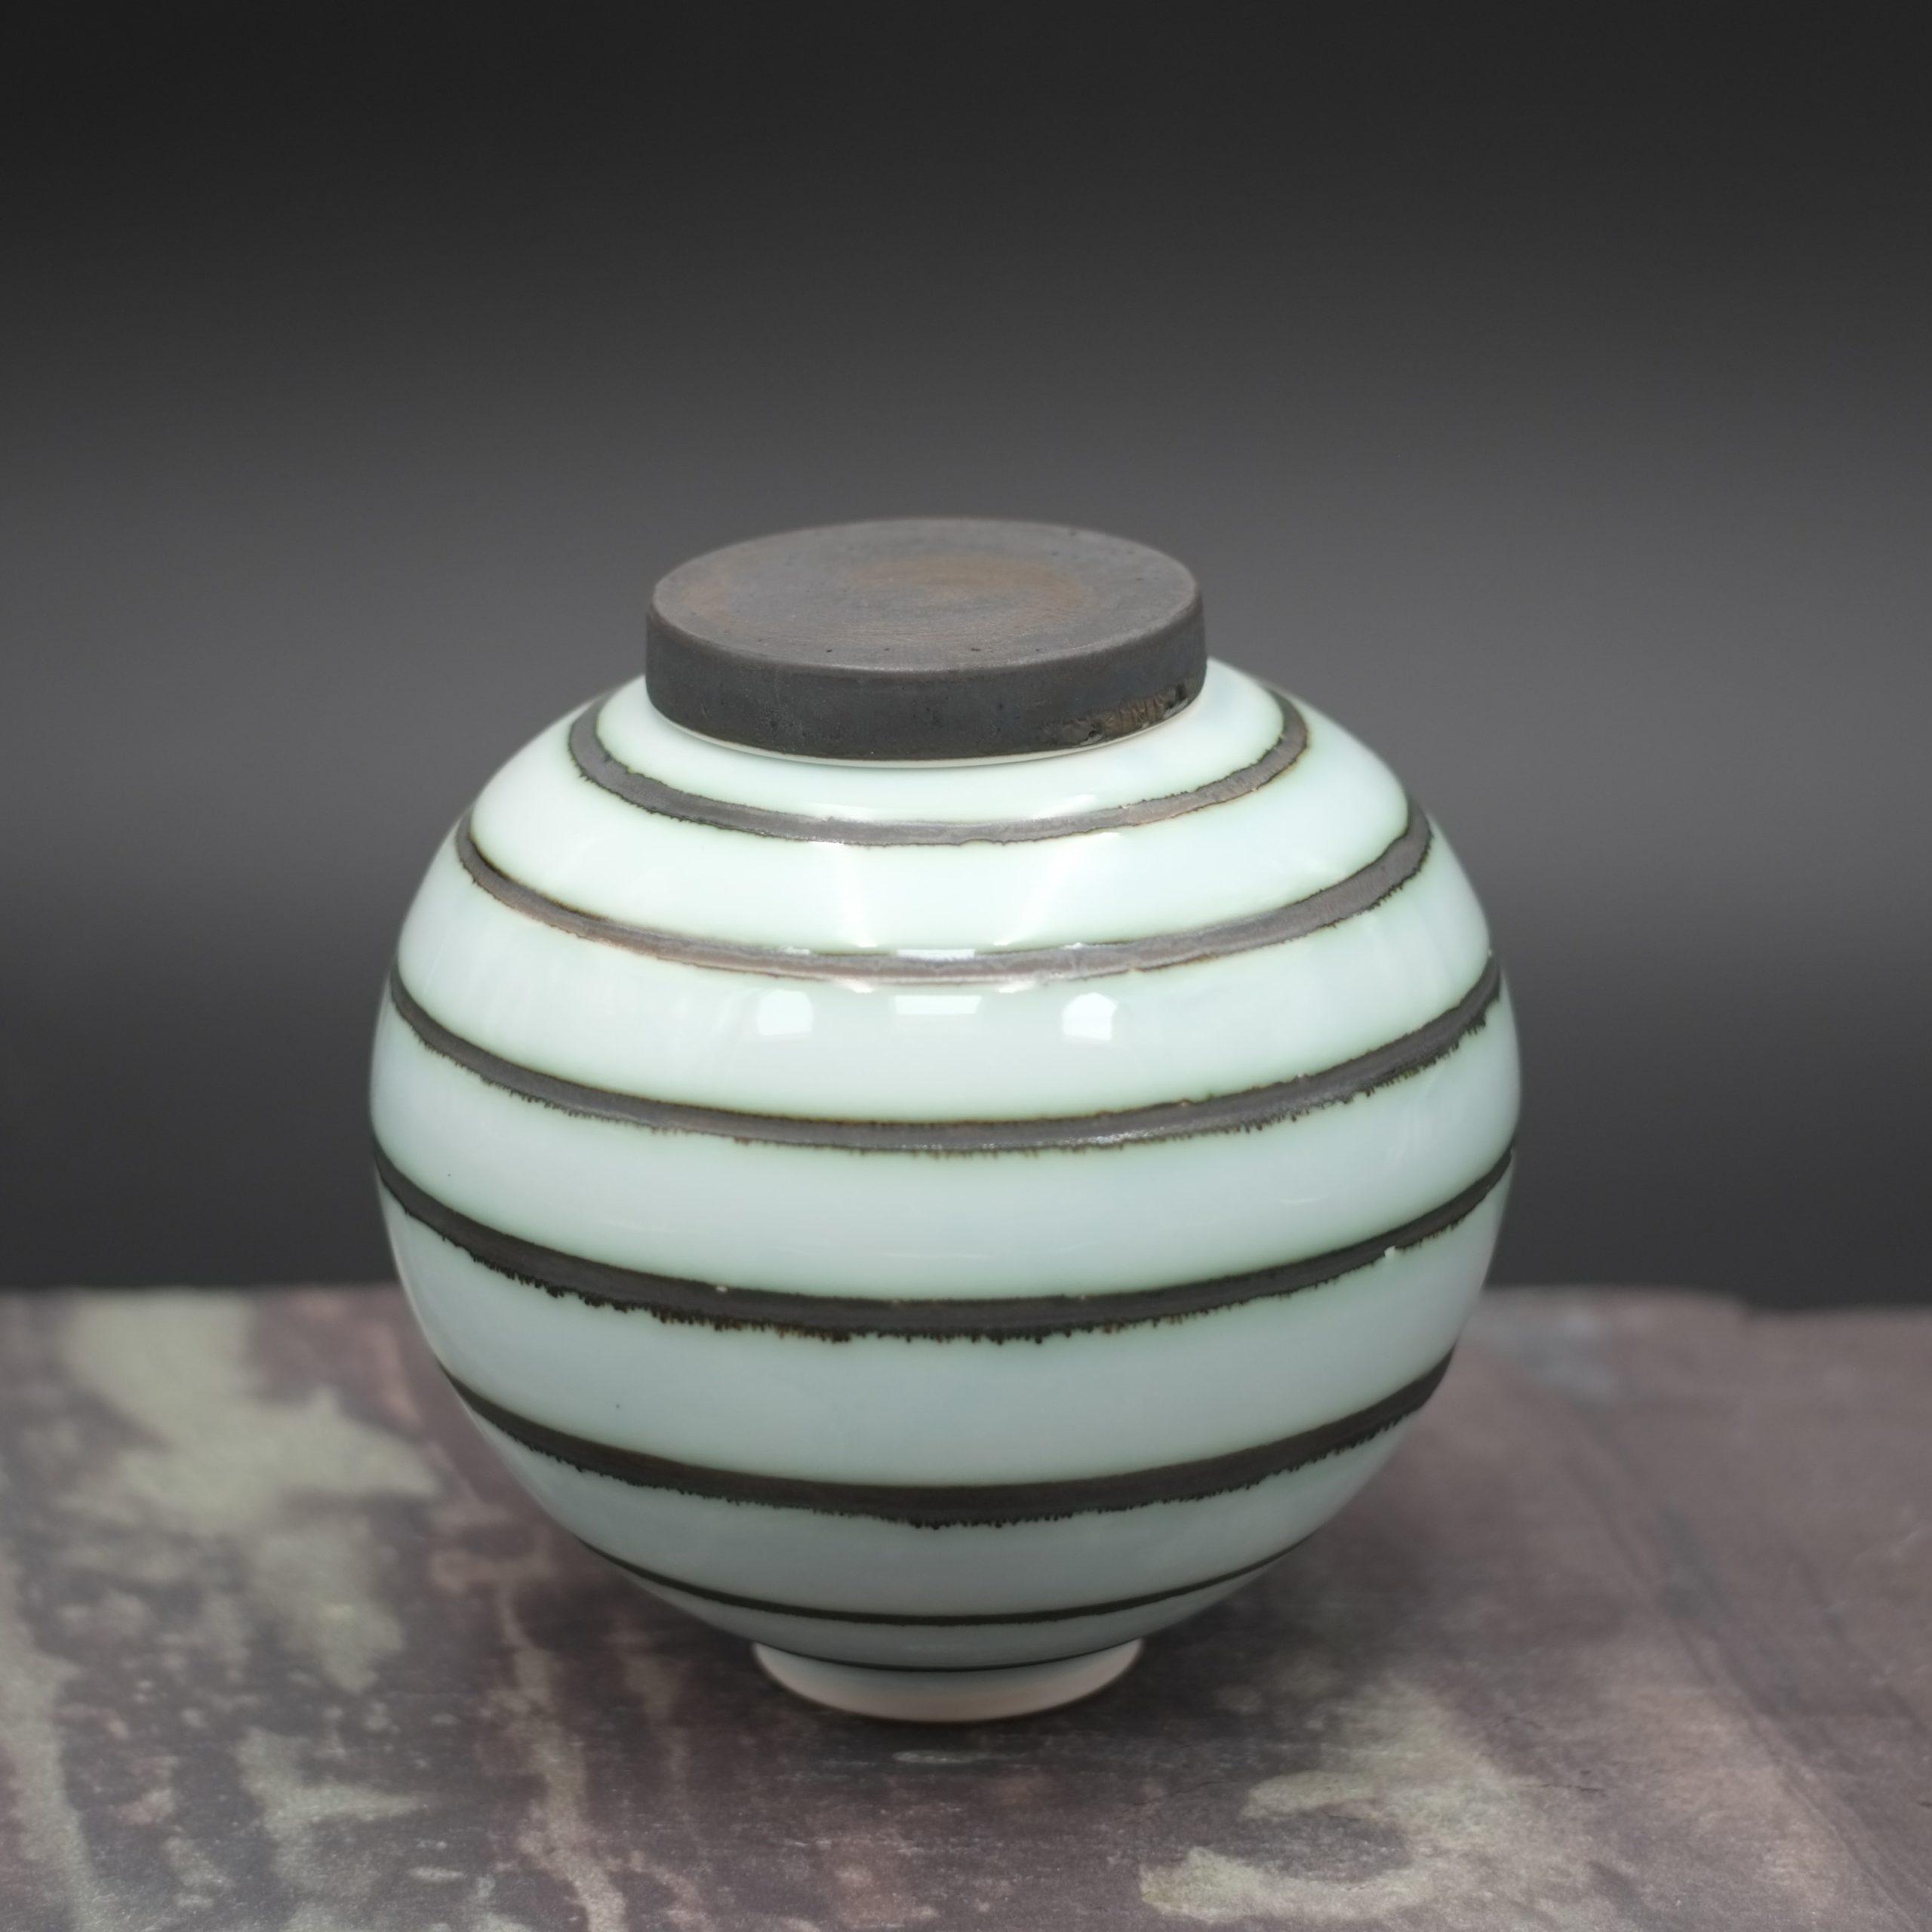 Tricia Thom. Ginger Jar (striped)